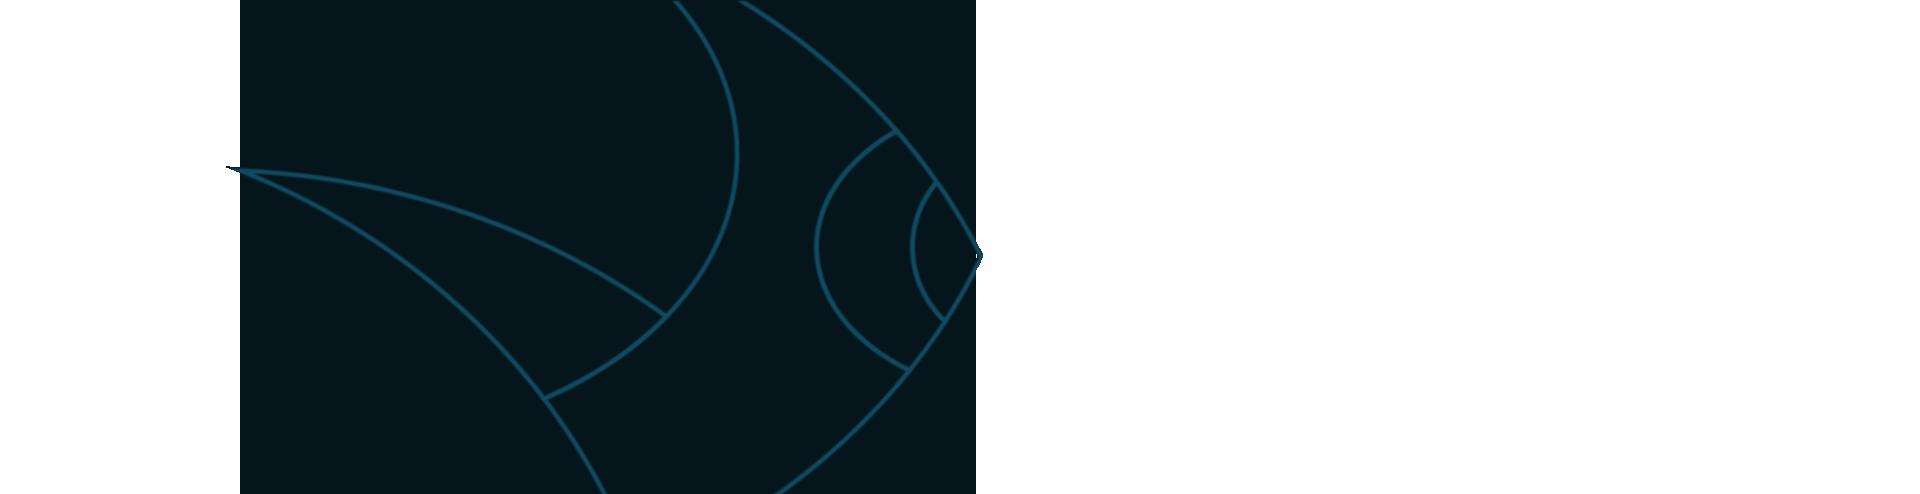 VCW Watermark Logo